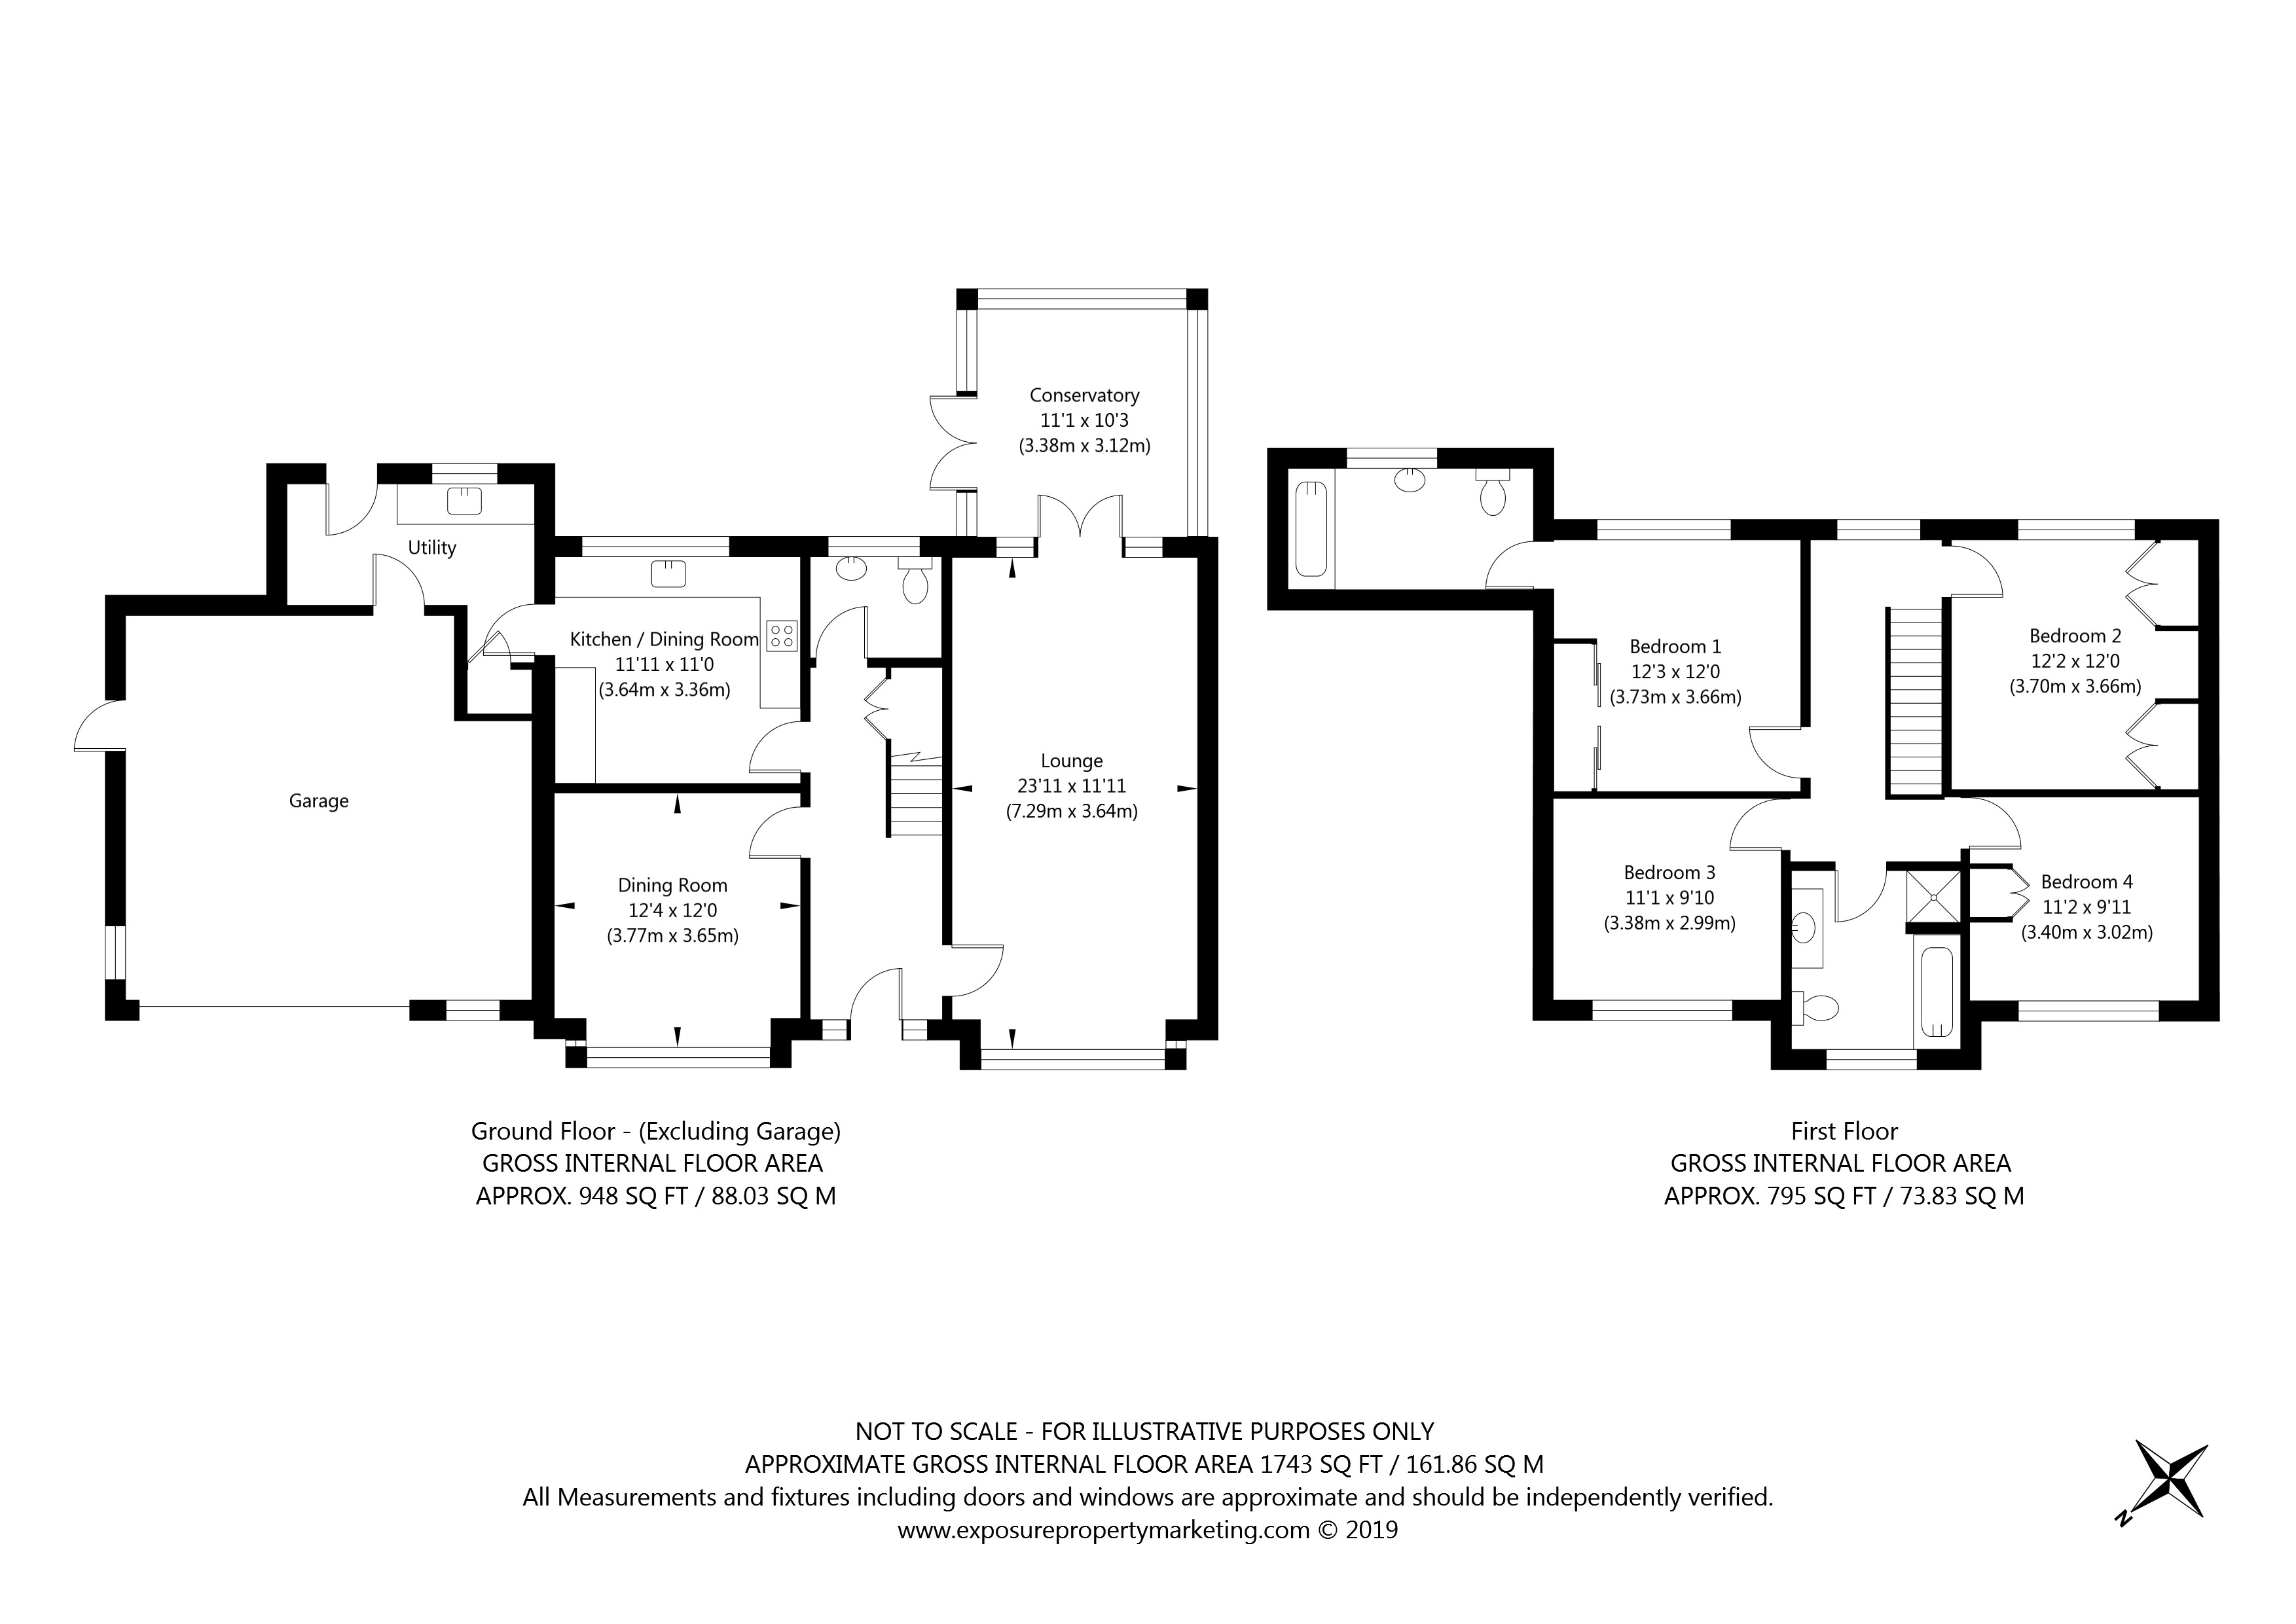 Wenlock Drive, Escrick, York property floorplan